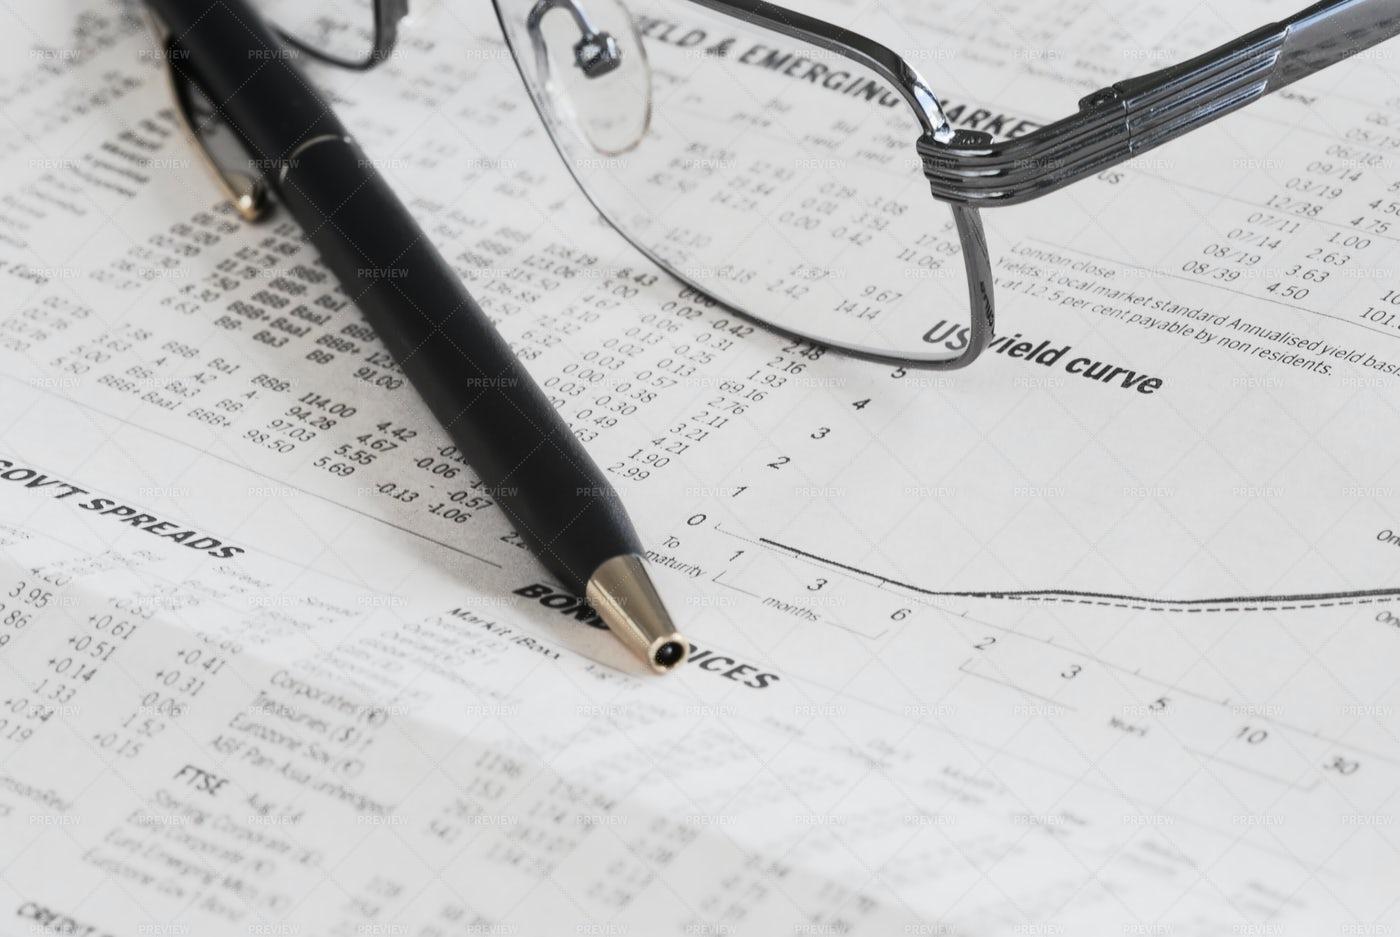 Financial Market Analysis: Stock Photos